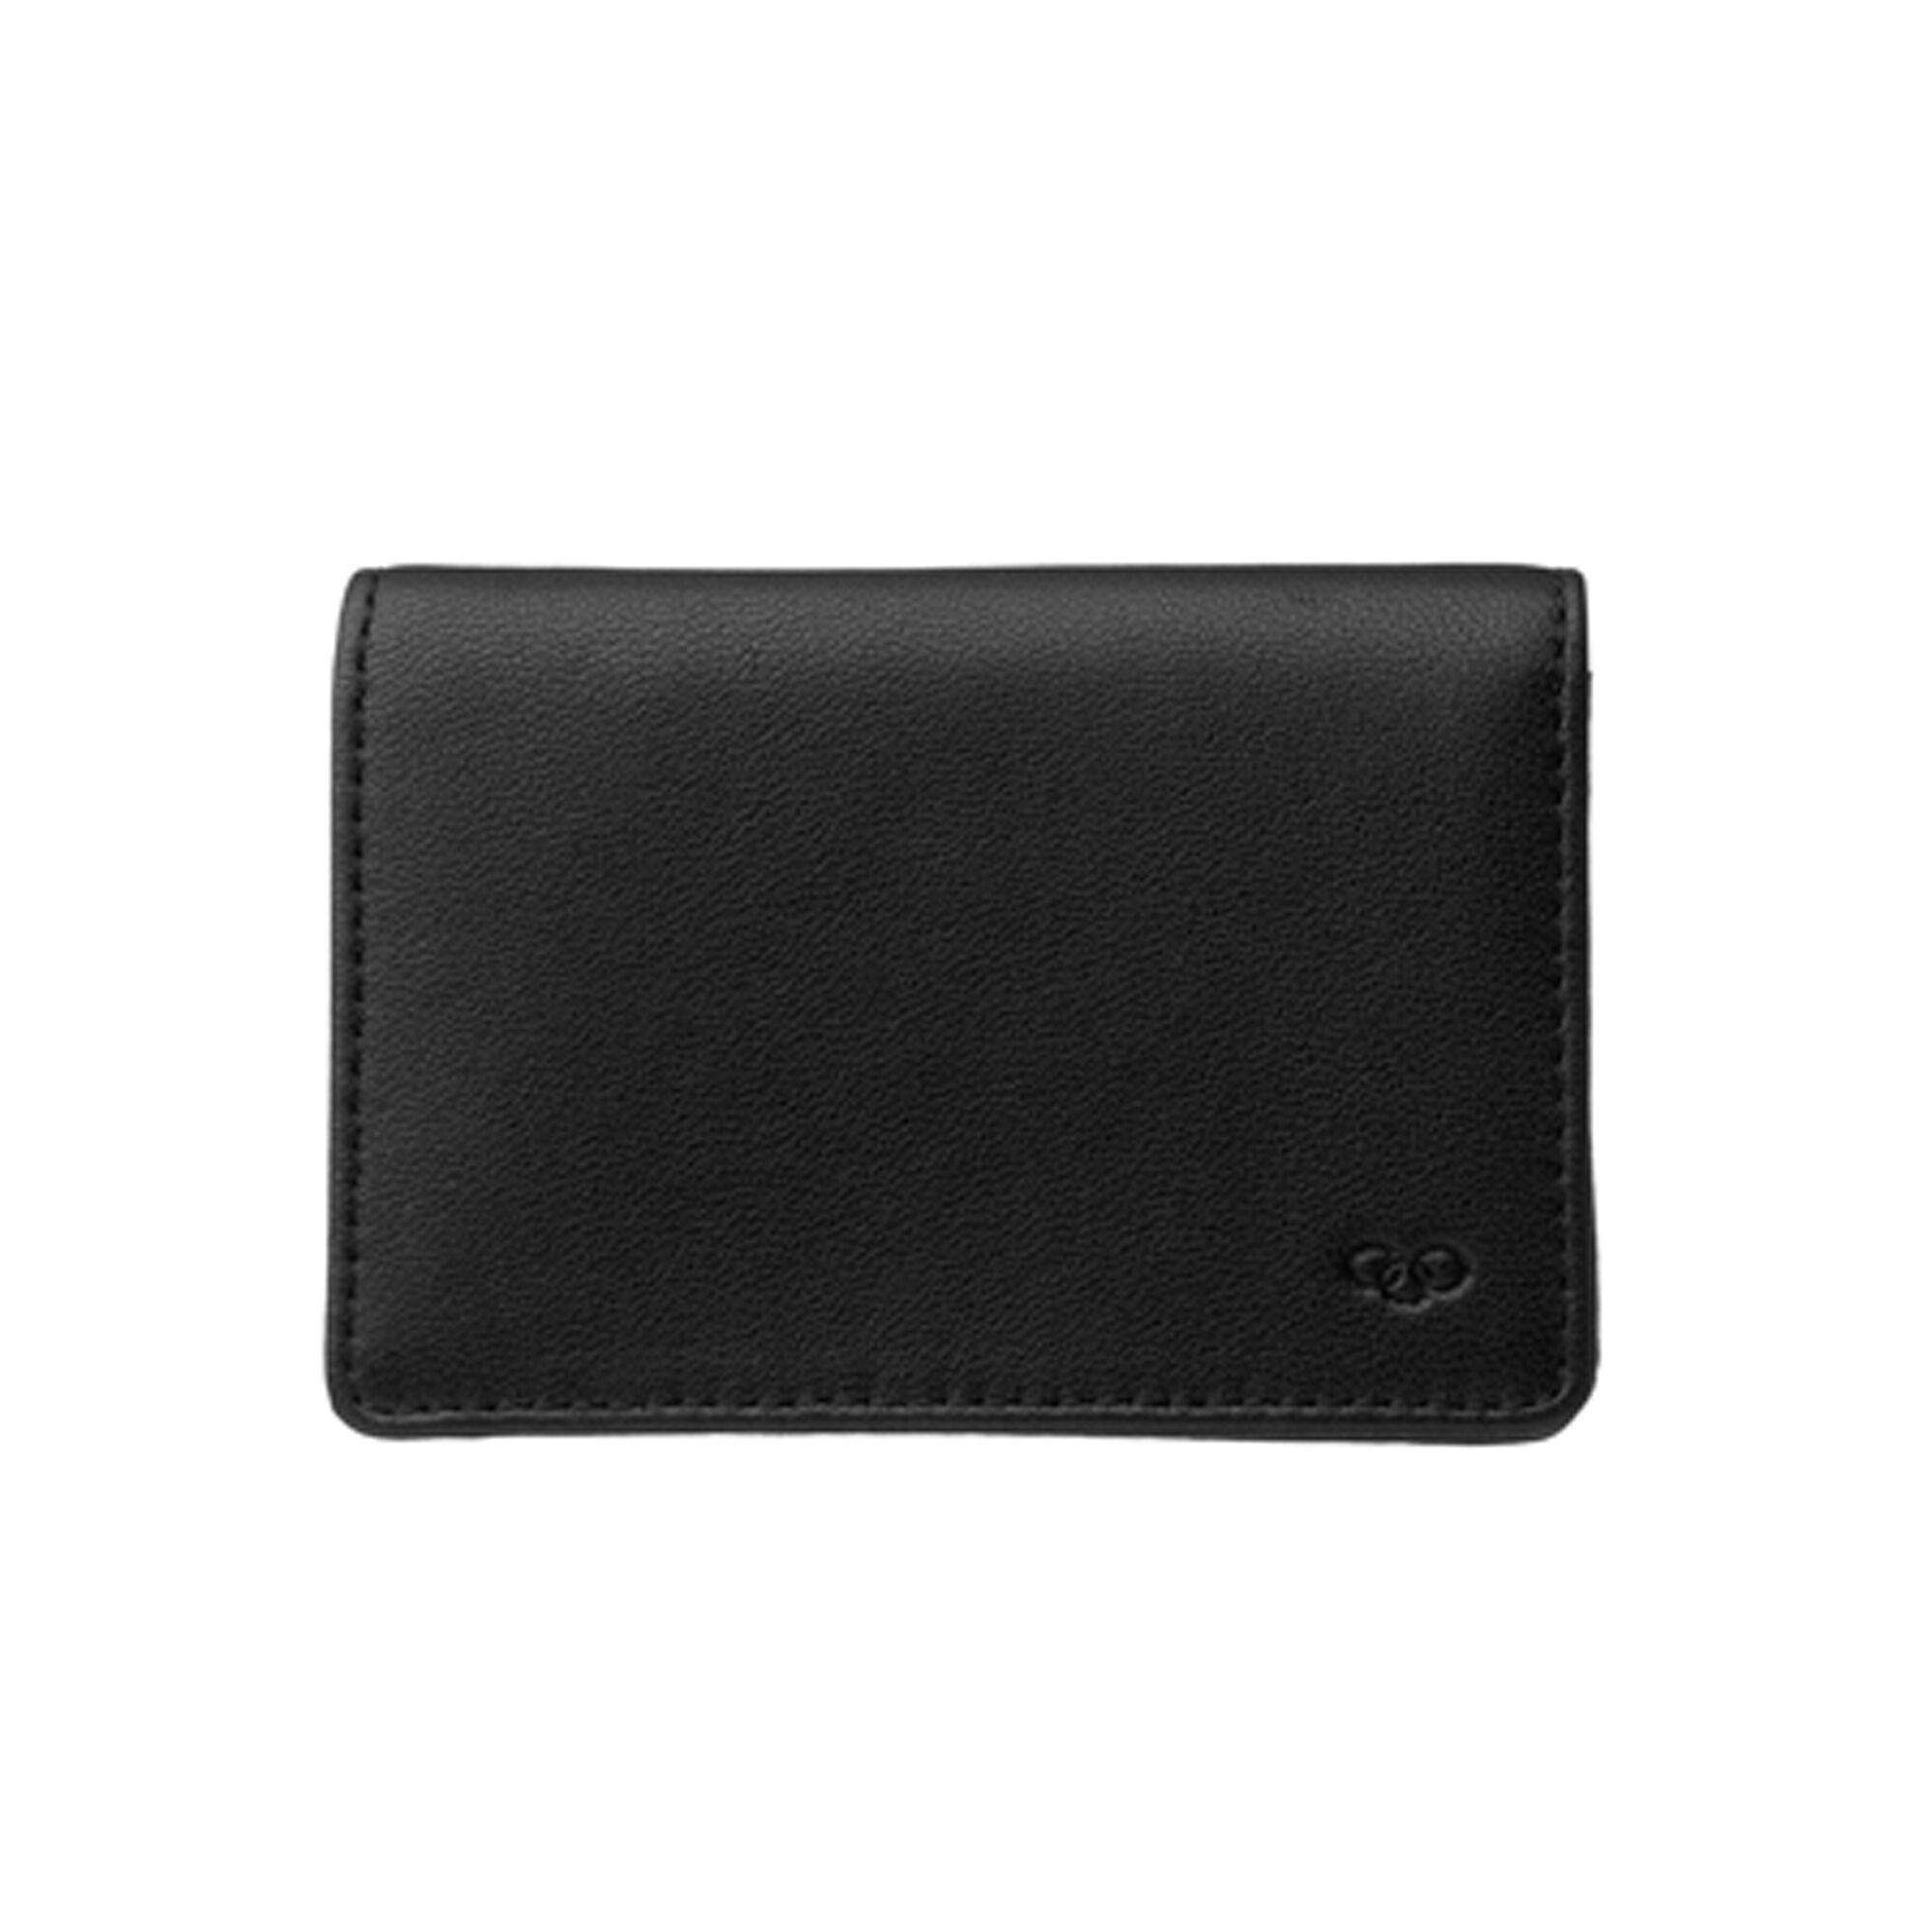 Black Leather Business Card Holder | Links of London